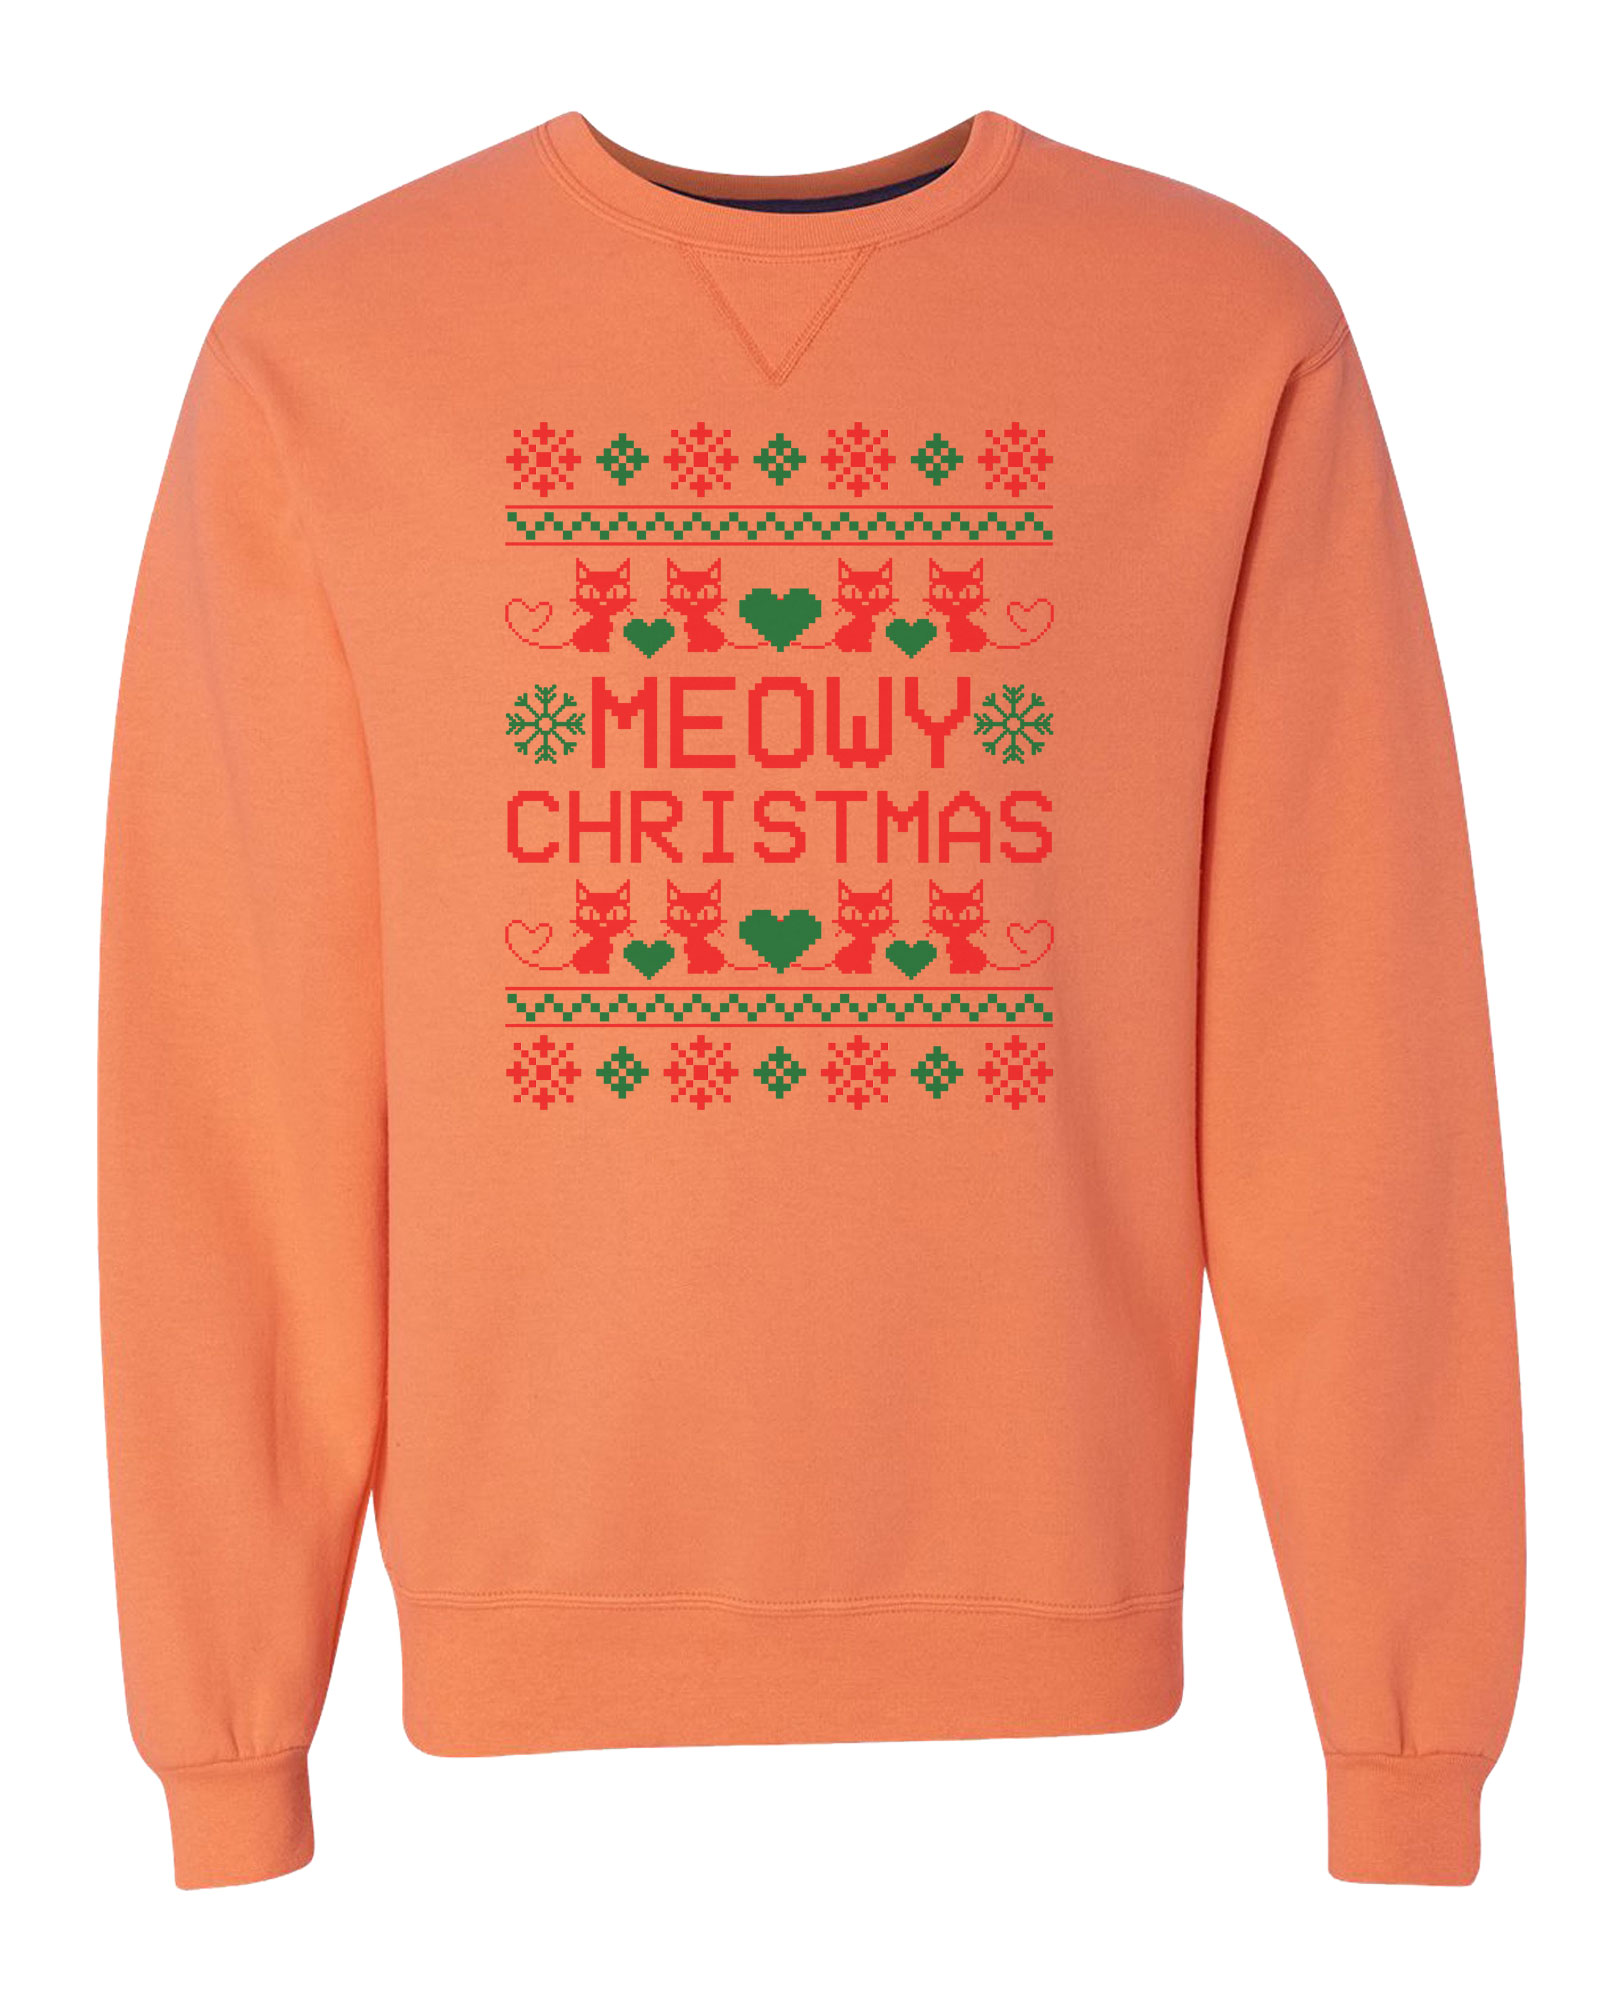 "Unisex Soft Sweatshirt ""Meowy Christmas"" Extra Soft Sweater - Cat Sweatshirt Large, Green"